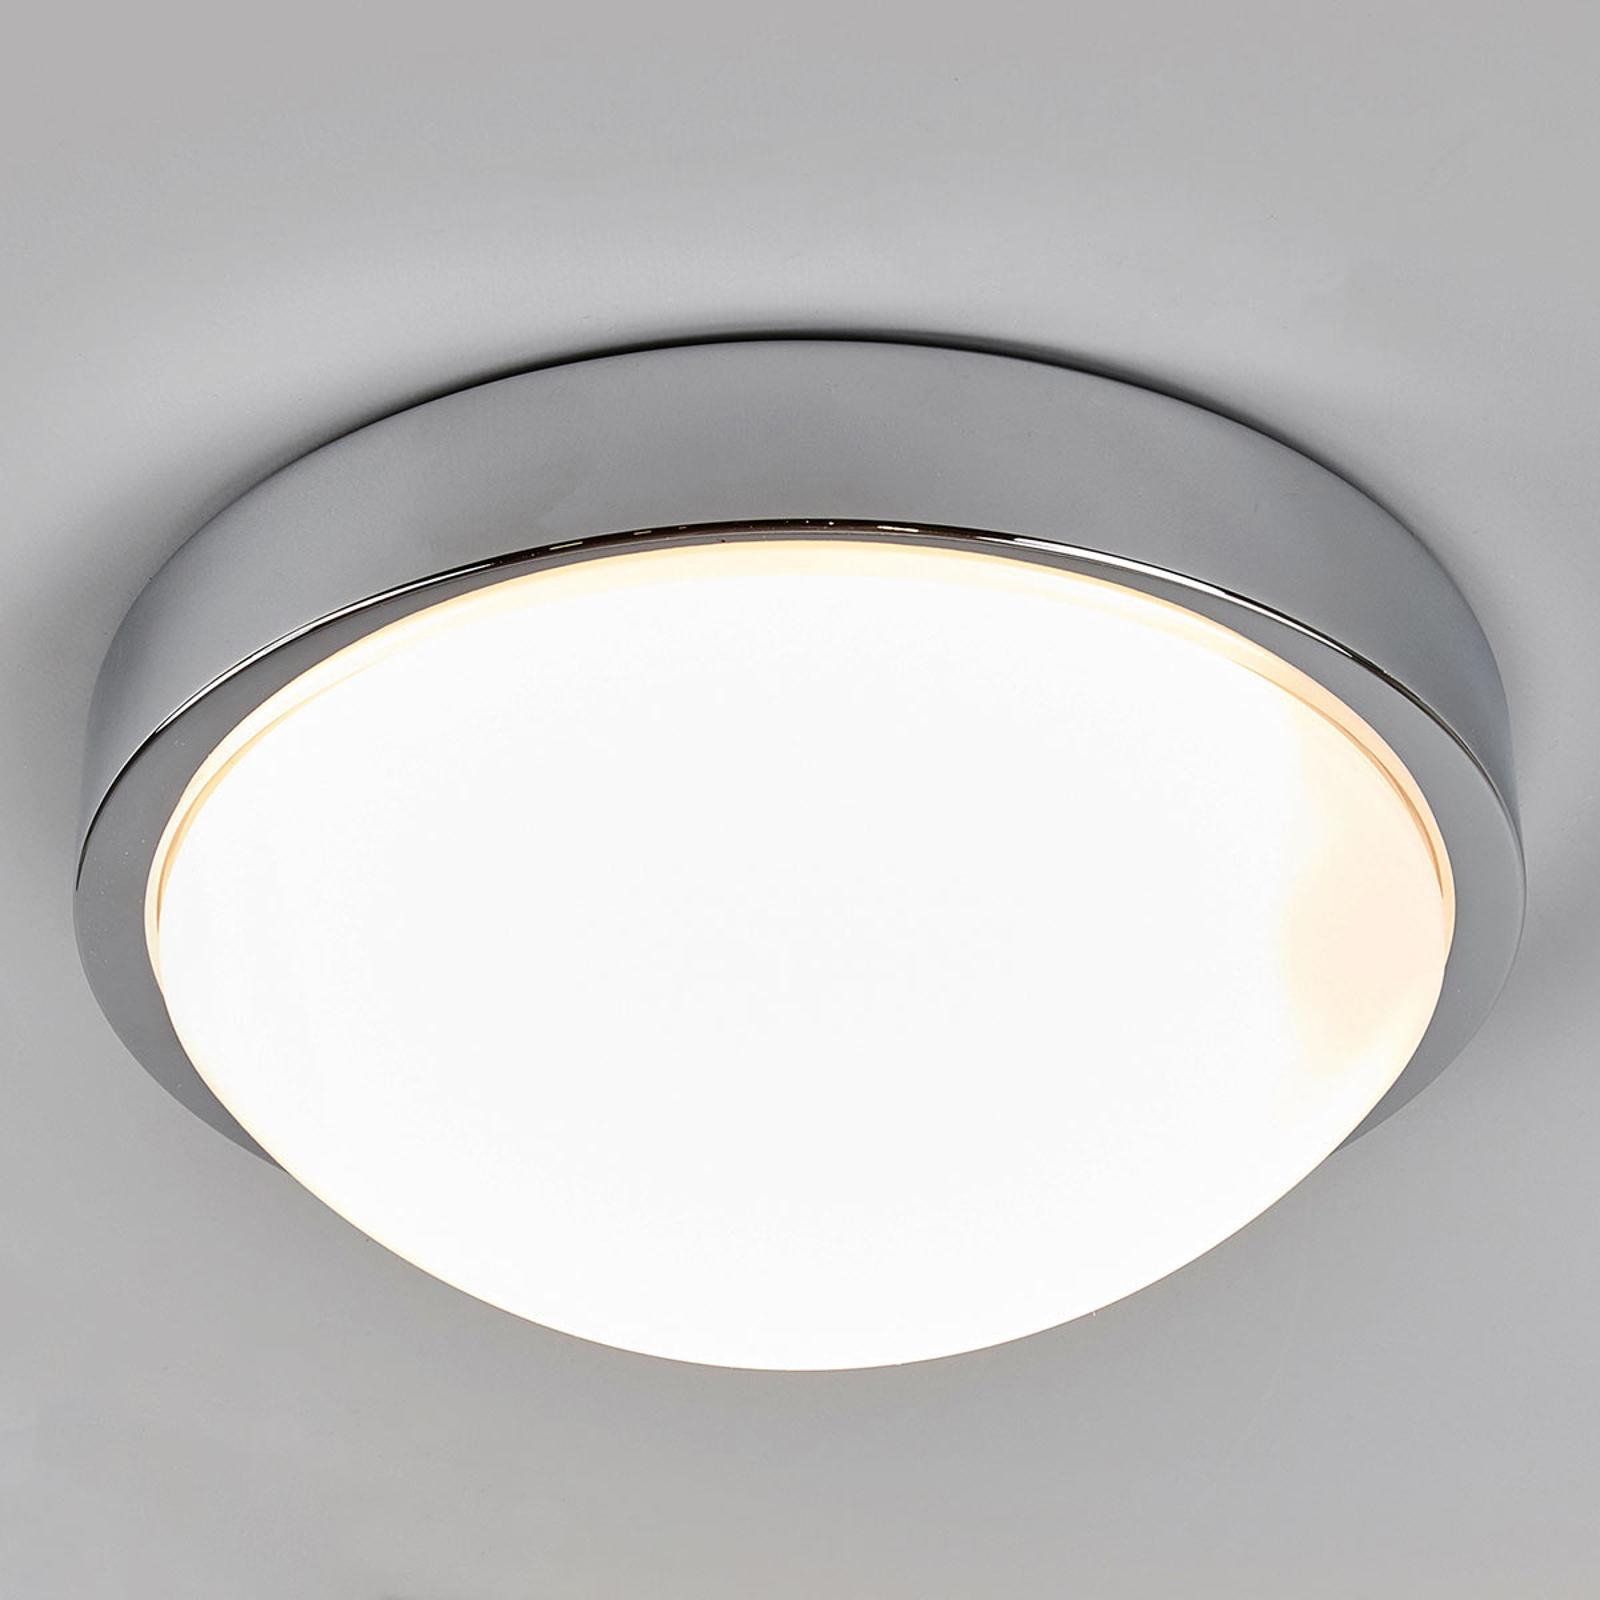 Chromowana łazienkowa lampa sufitowa Elucio, IP44